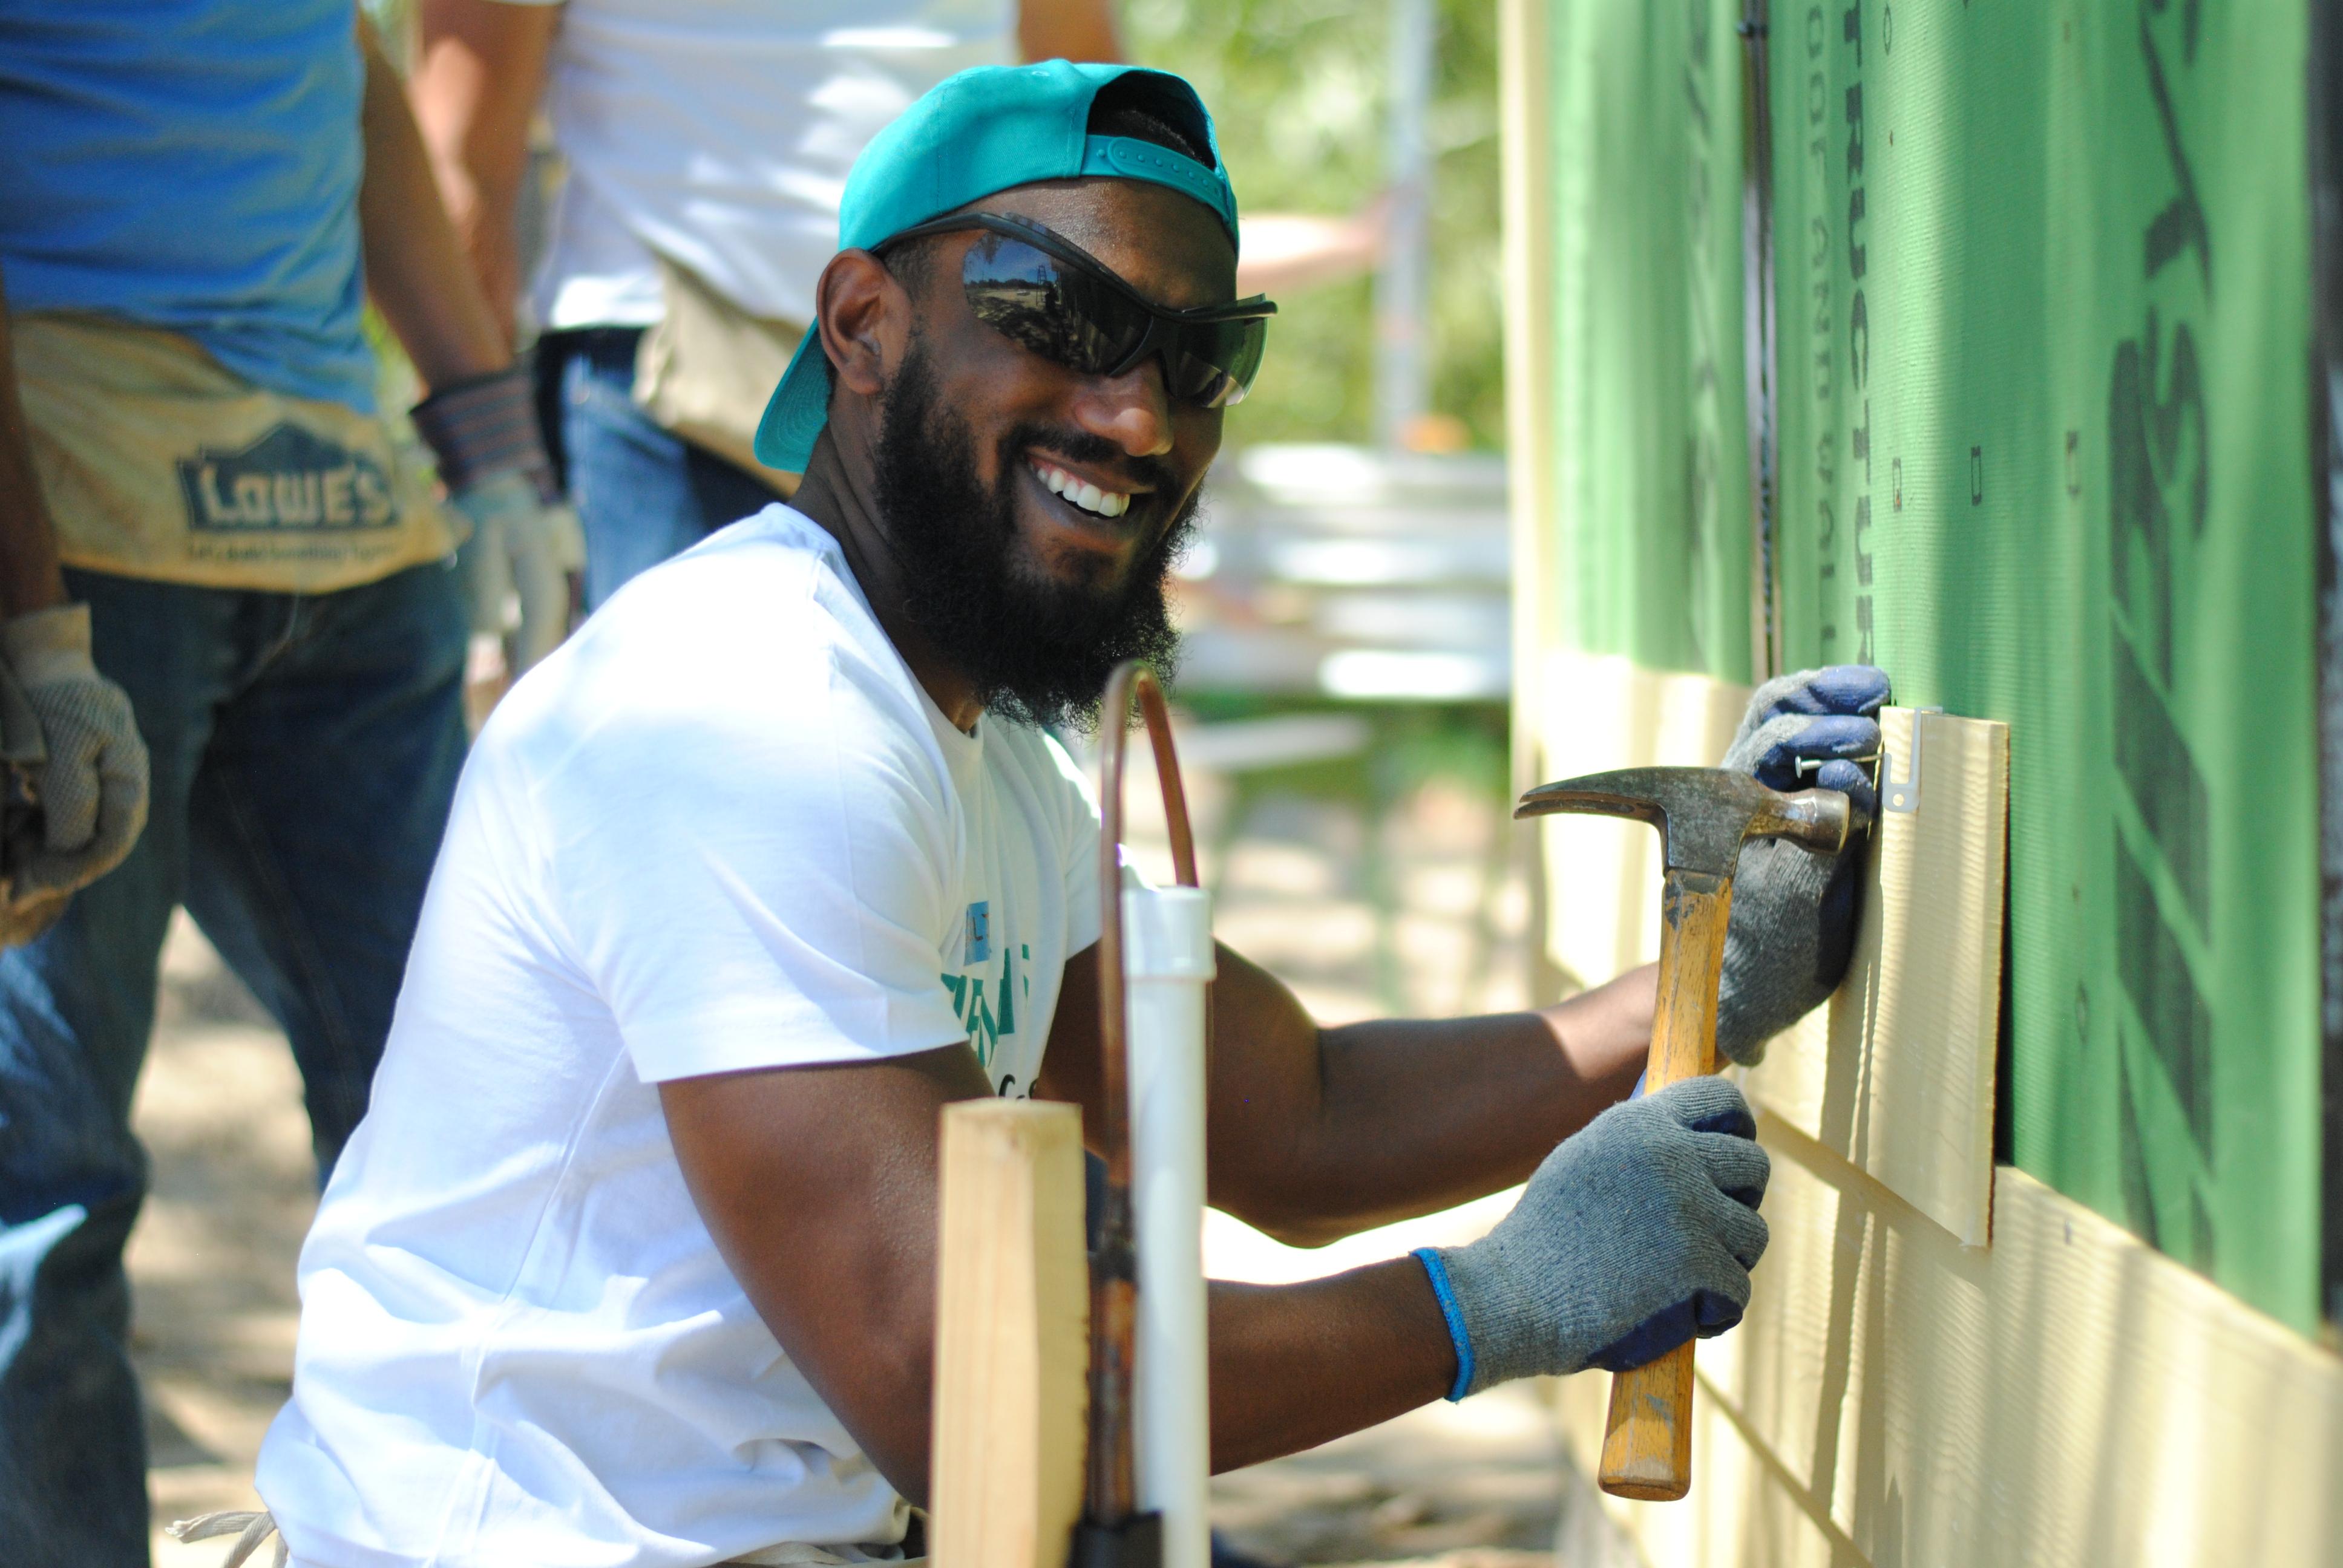 Smiling volunteer installing siding outside in-progress home